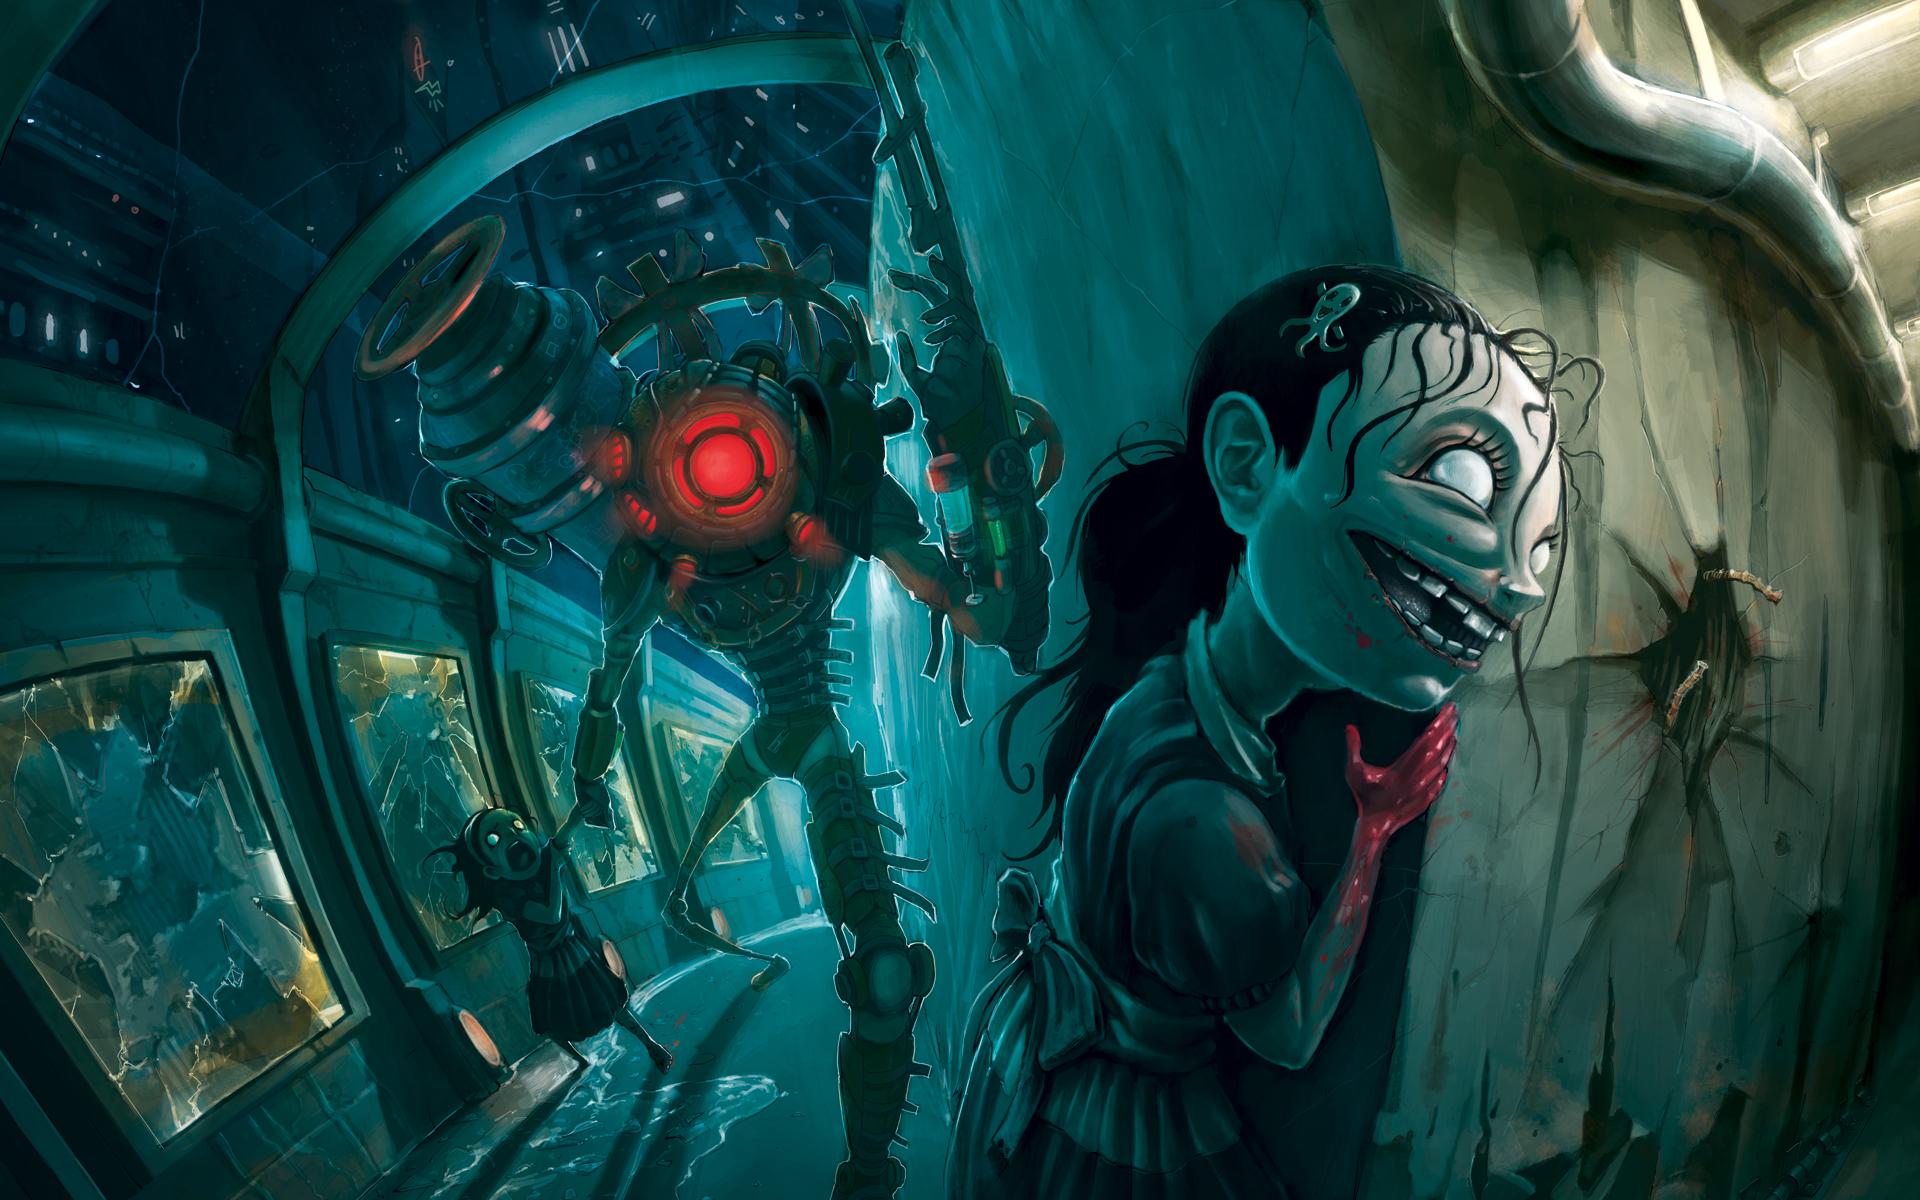 Bioshock 2 Sisters Big Sister Wallpaper By Jhonen Vasquez Creator